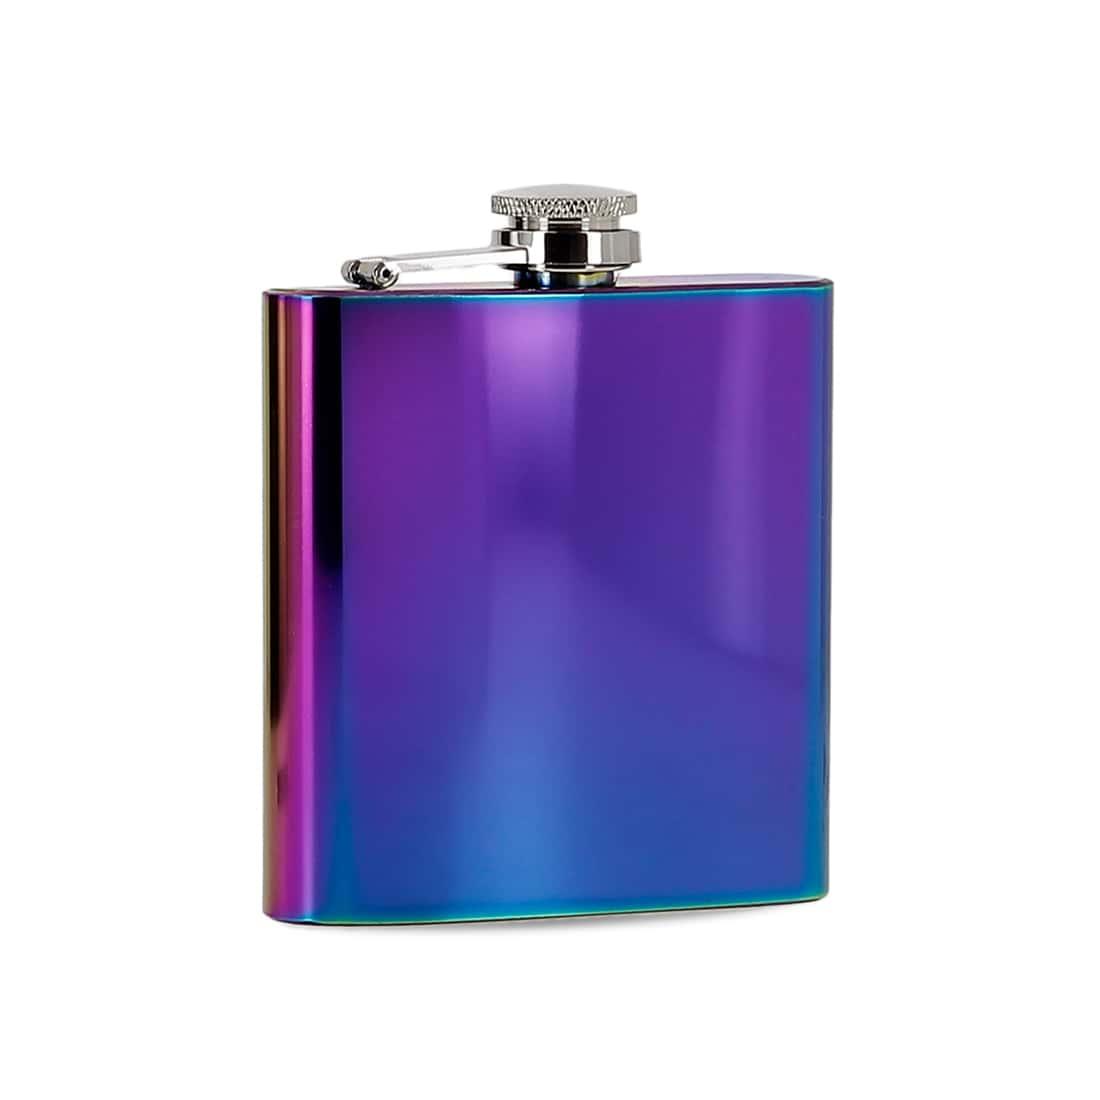 Photo #1 de Coffret Flasque Alcool Etui Cigarette Spectrum